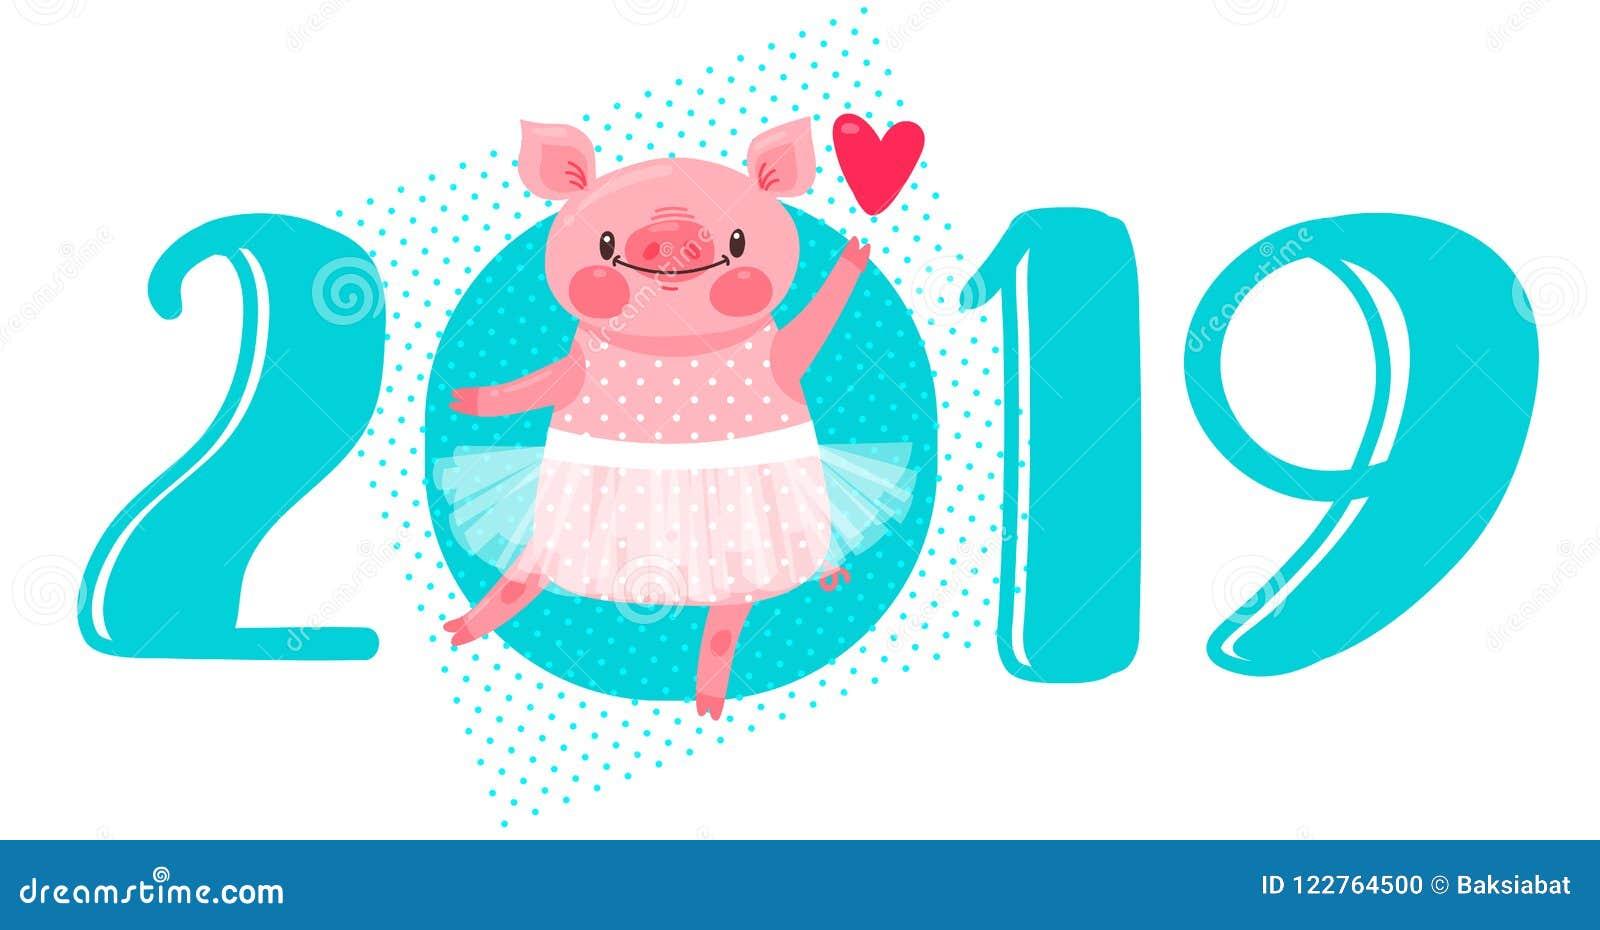 e66fb8f748e 2019 σχέδιο καρτών καλής χρονιάς Διανυσματική απεικόνιση με 2019 αριθμούς  και γλυκός χοίρος χορού στο tutu μπαλέτου Αριθμοί και σύμβολο του κινεζικού  ...